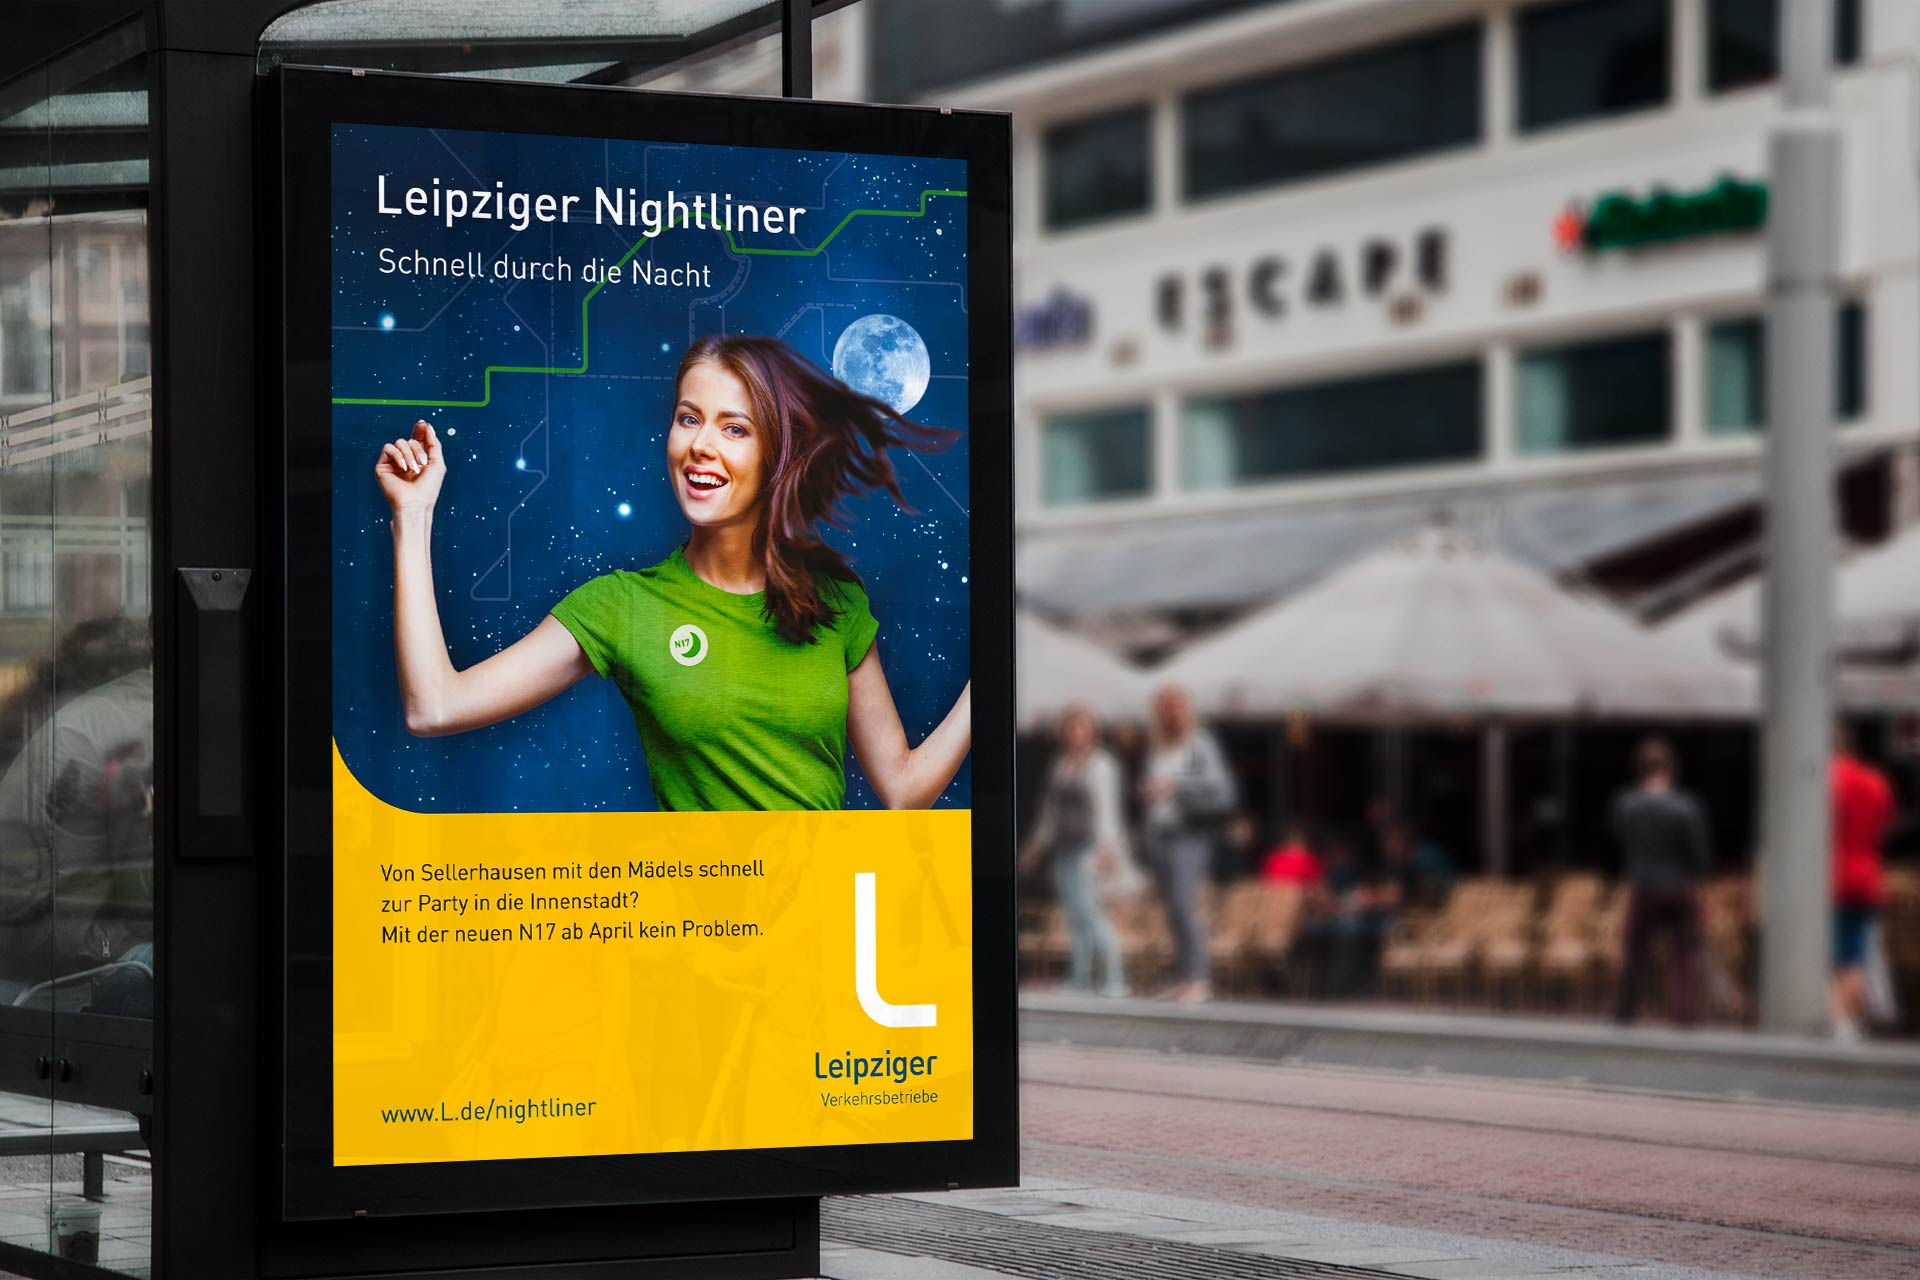 Plakatmotiv Leipziger Nightliner mit Frau